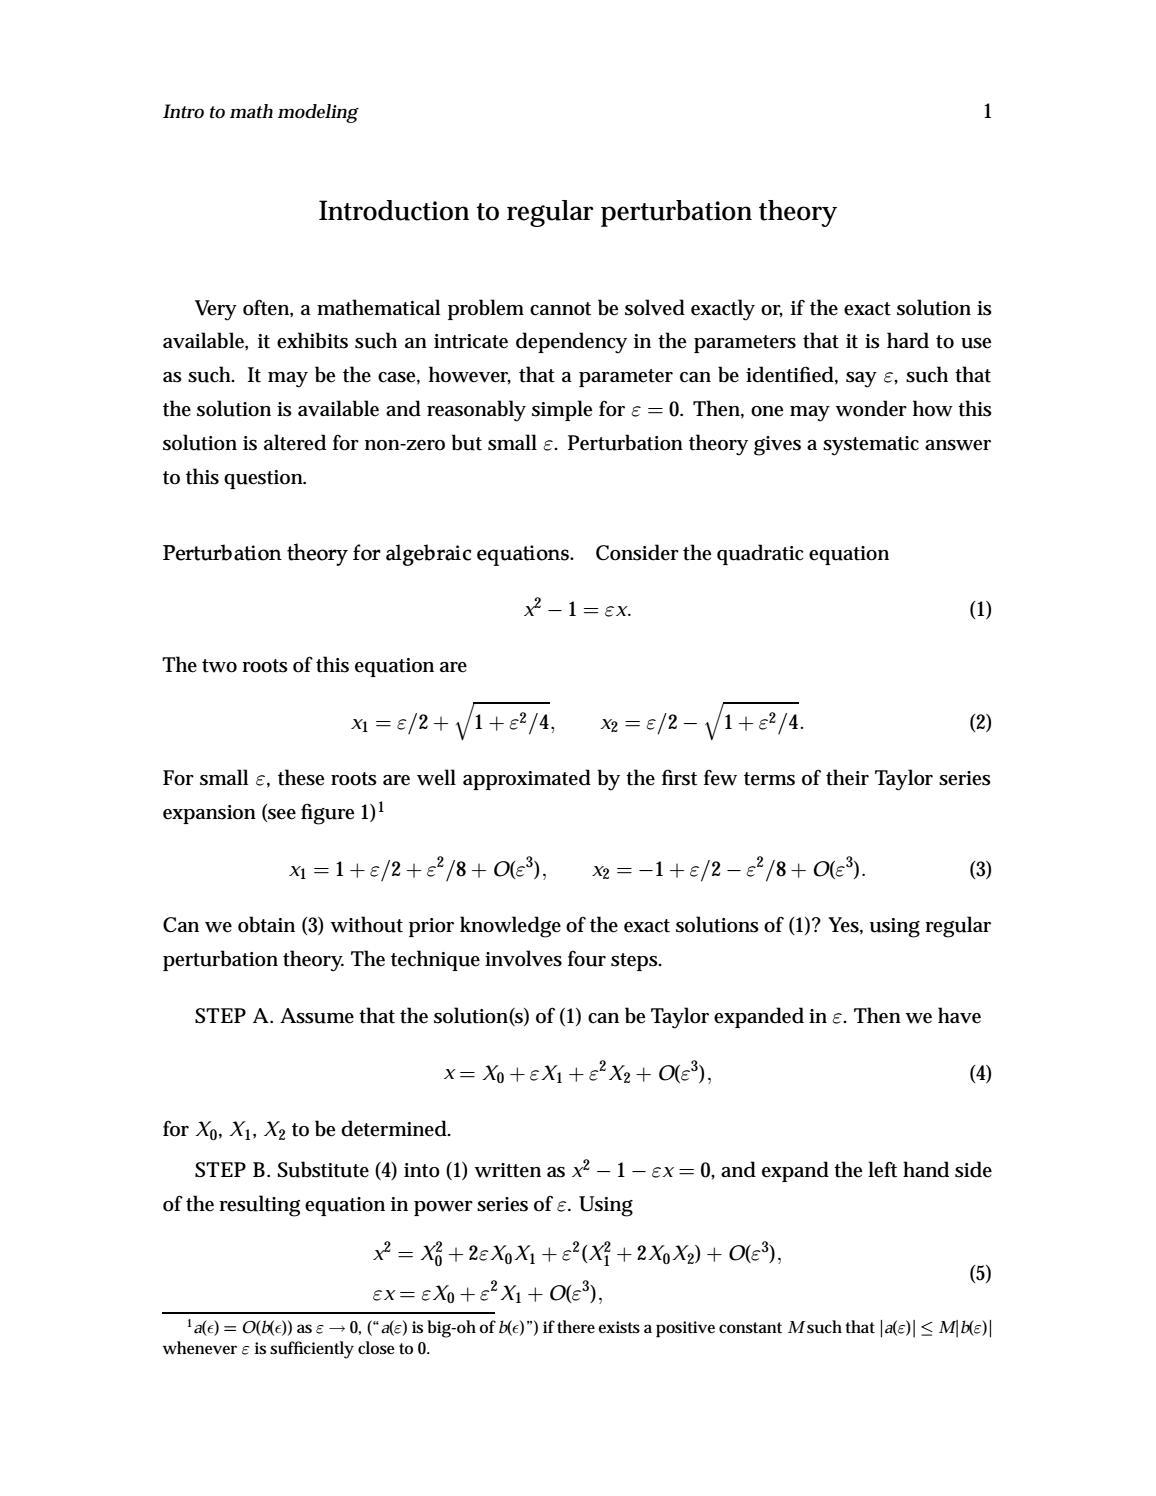 Perturb_regular pdf by rdv0044 - issuu